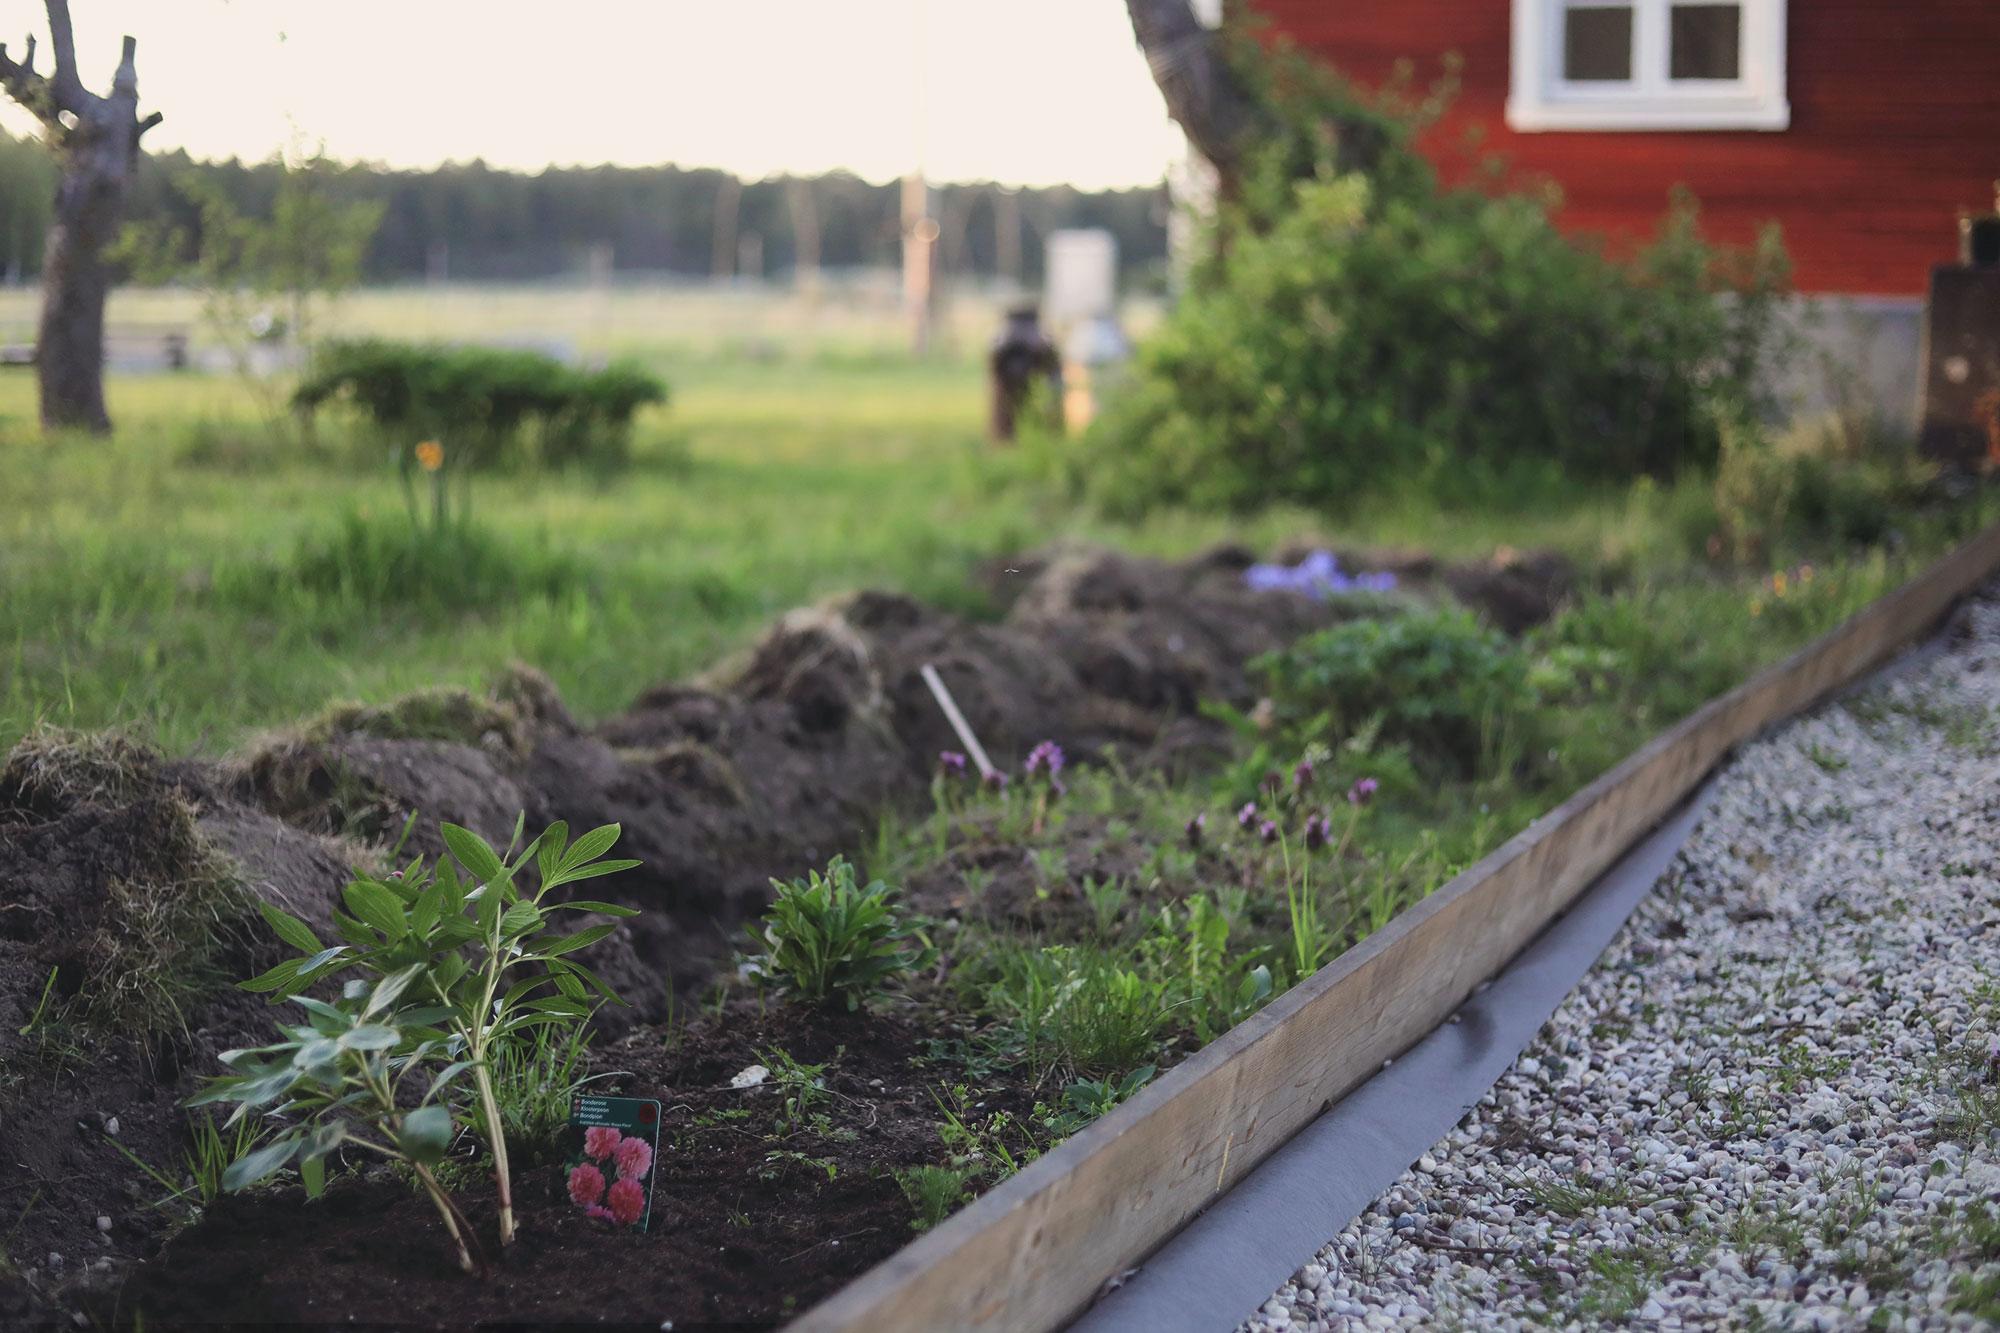 perennrabatt perenner trädgård torp skiss grusgång